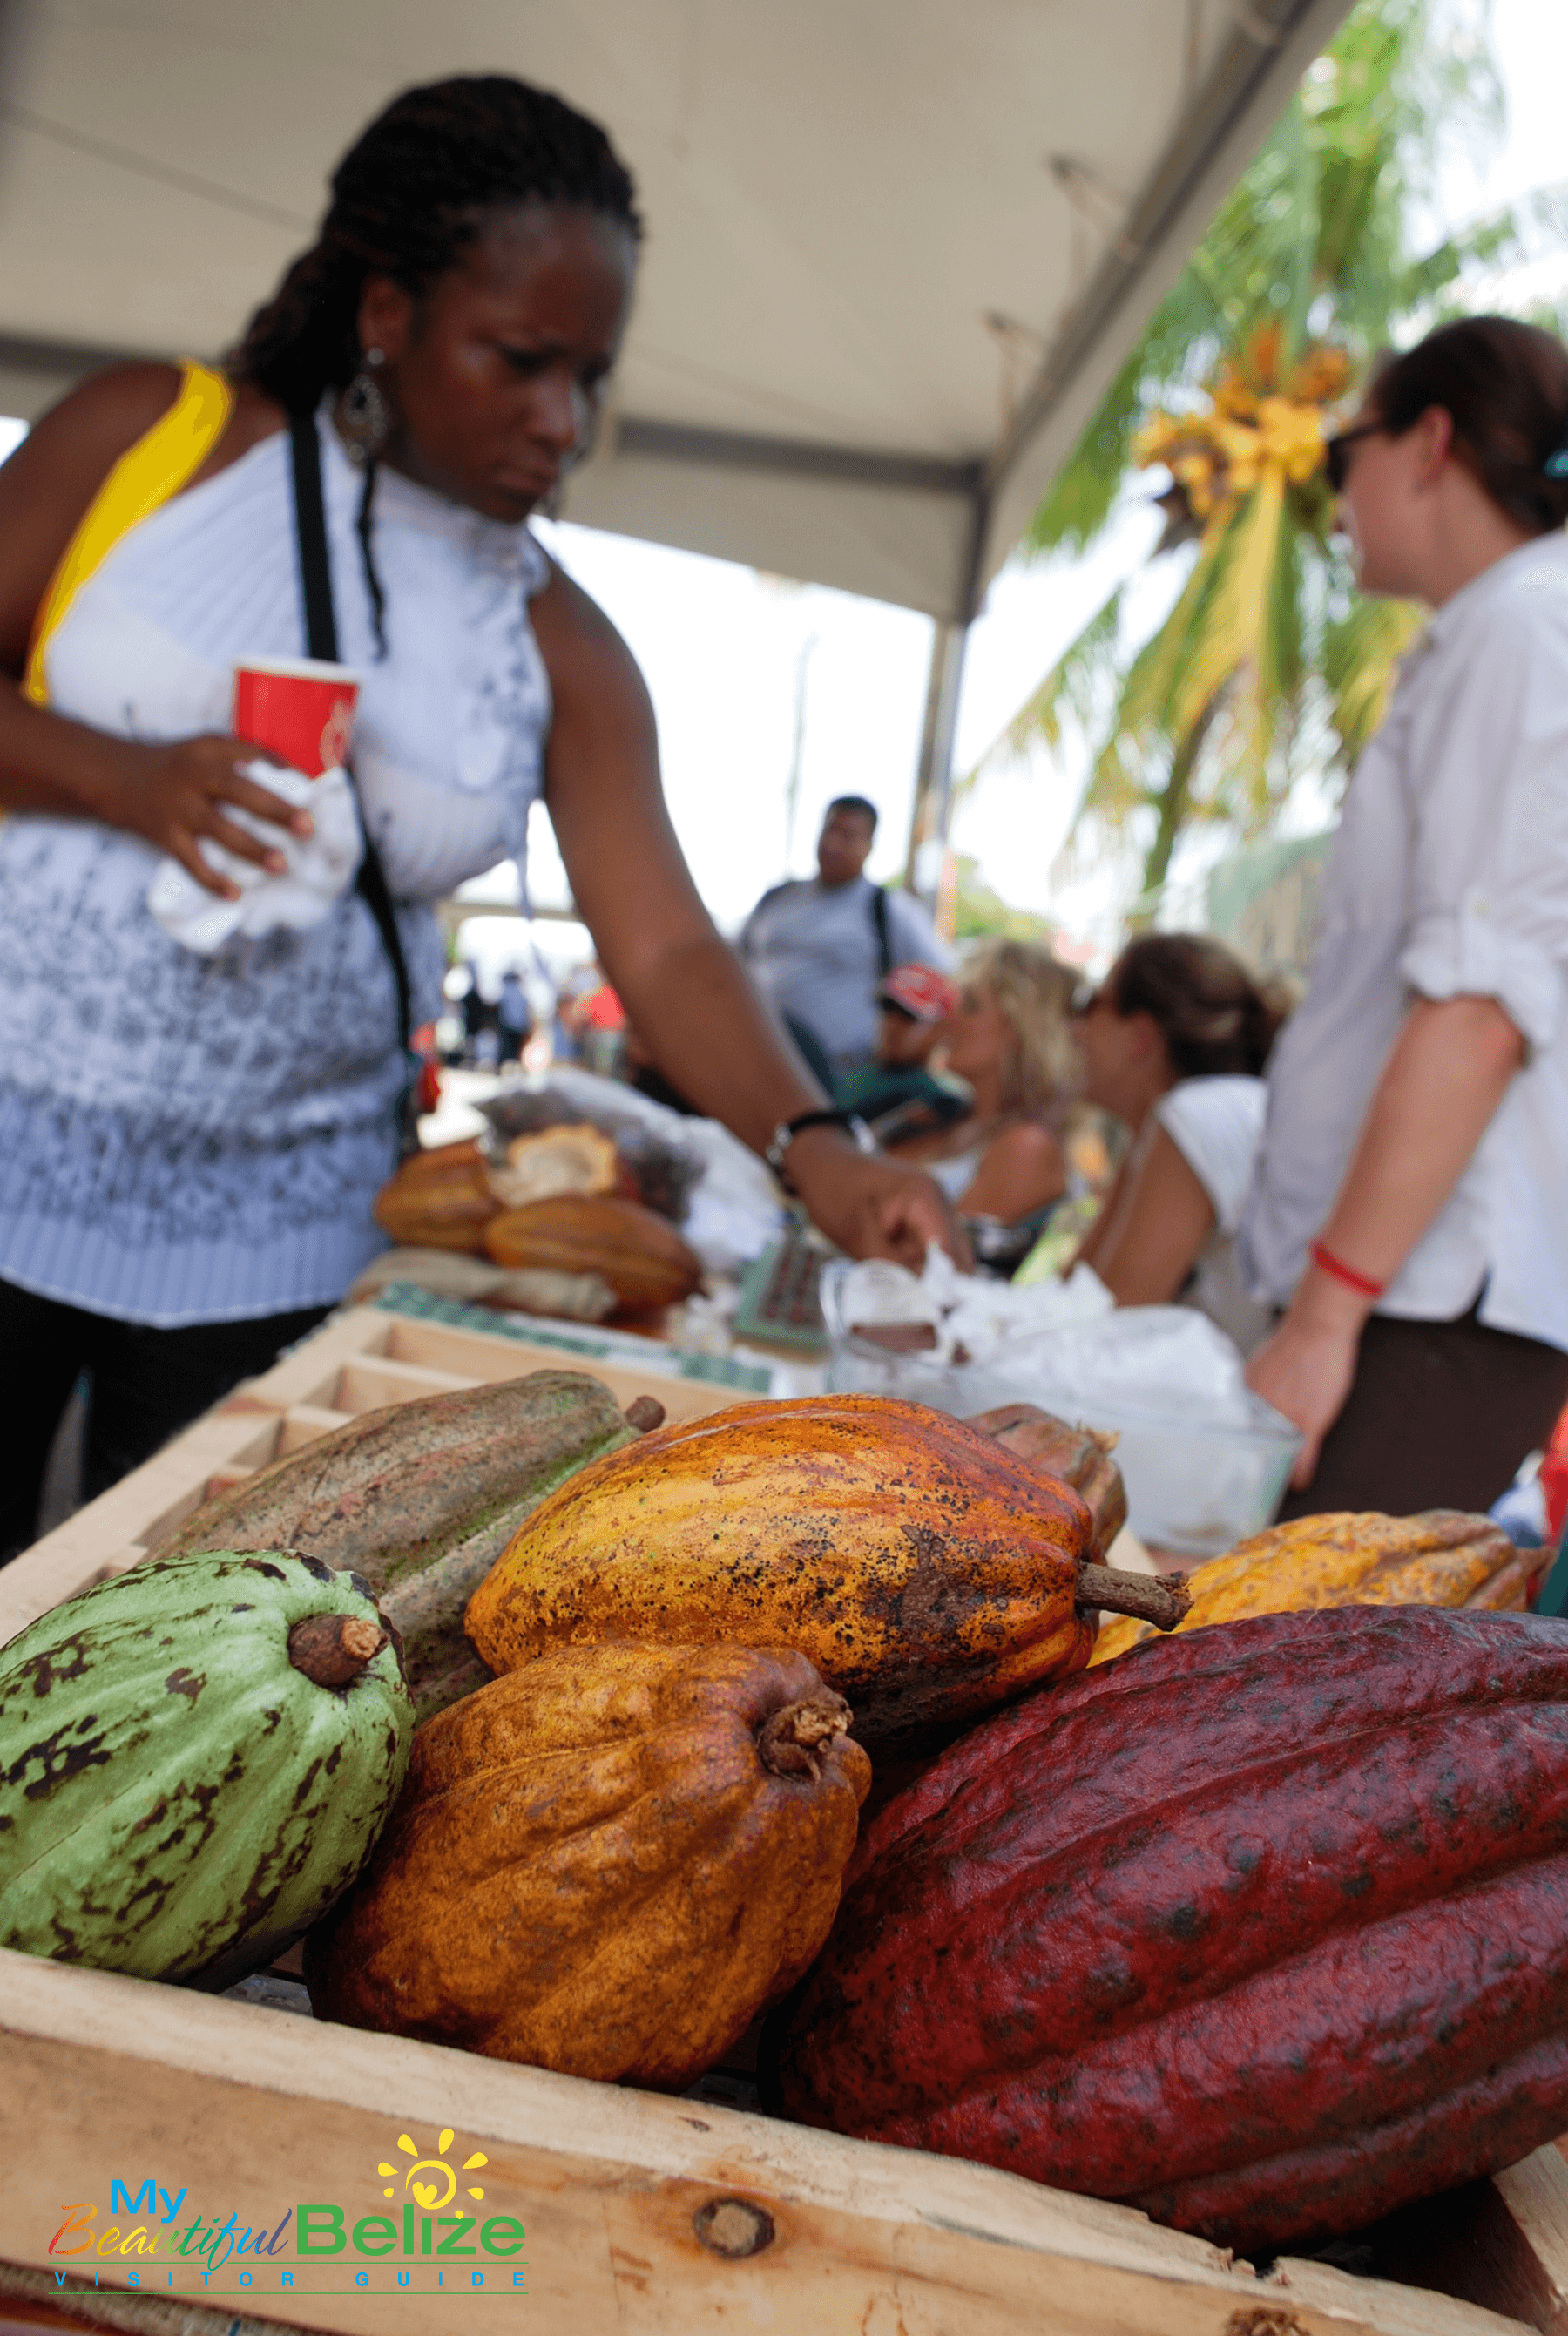 toledo cacao festival 2012 cacao fruit my beautiful belize